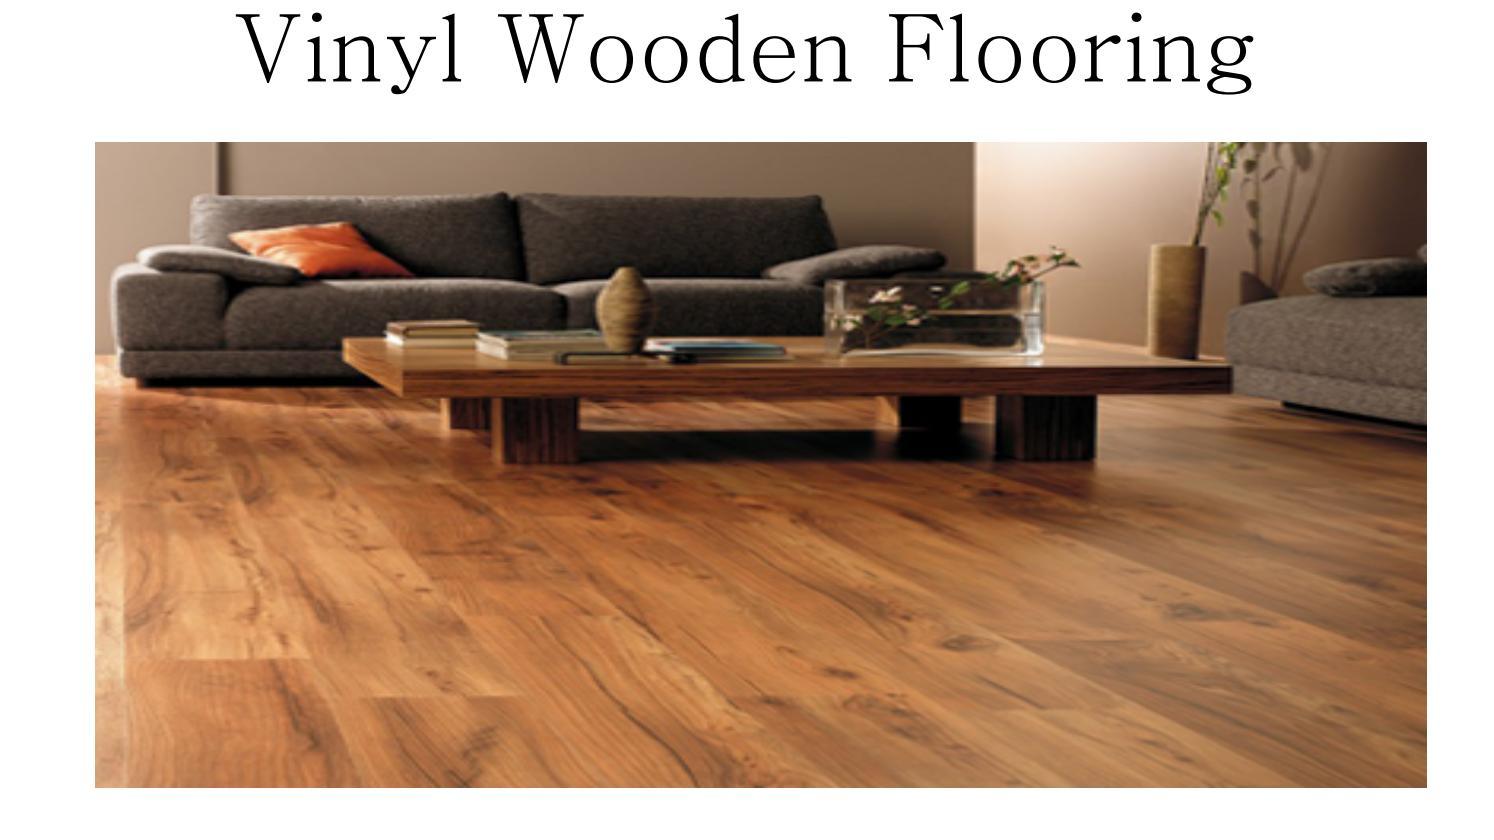 Vinyl Wooden Flooring In Dubai By John Smith Issuu